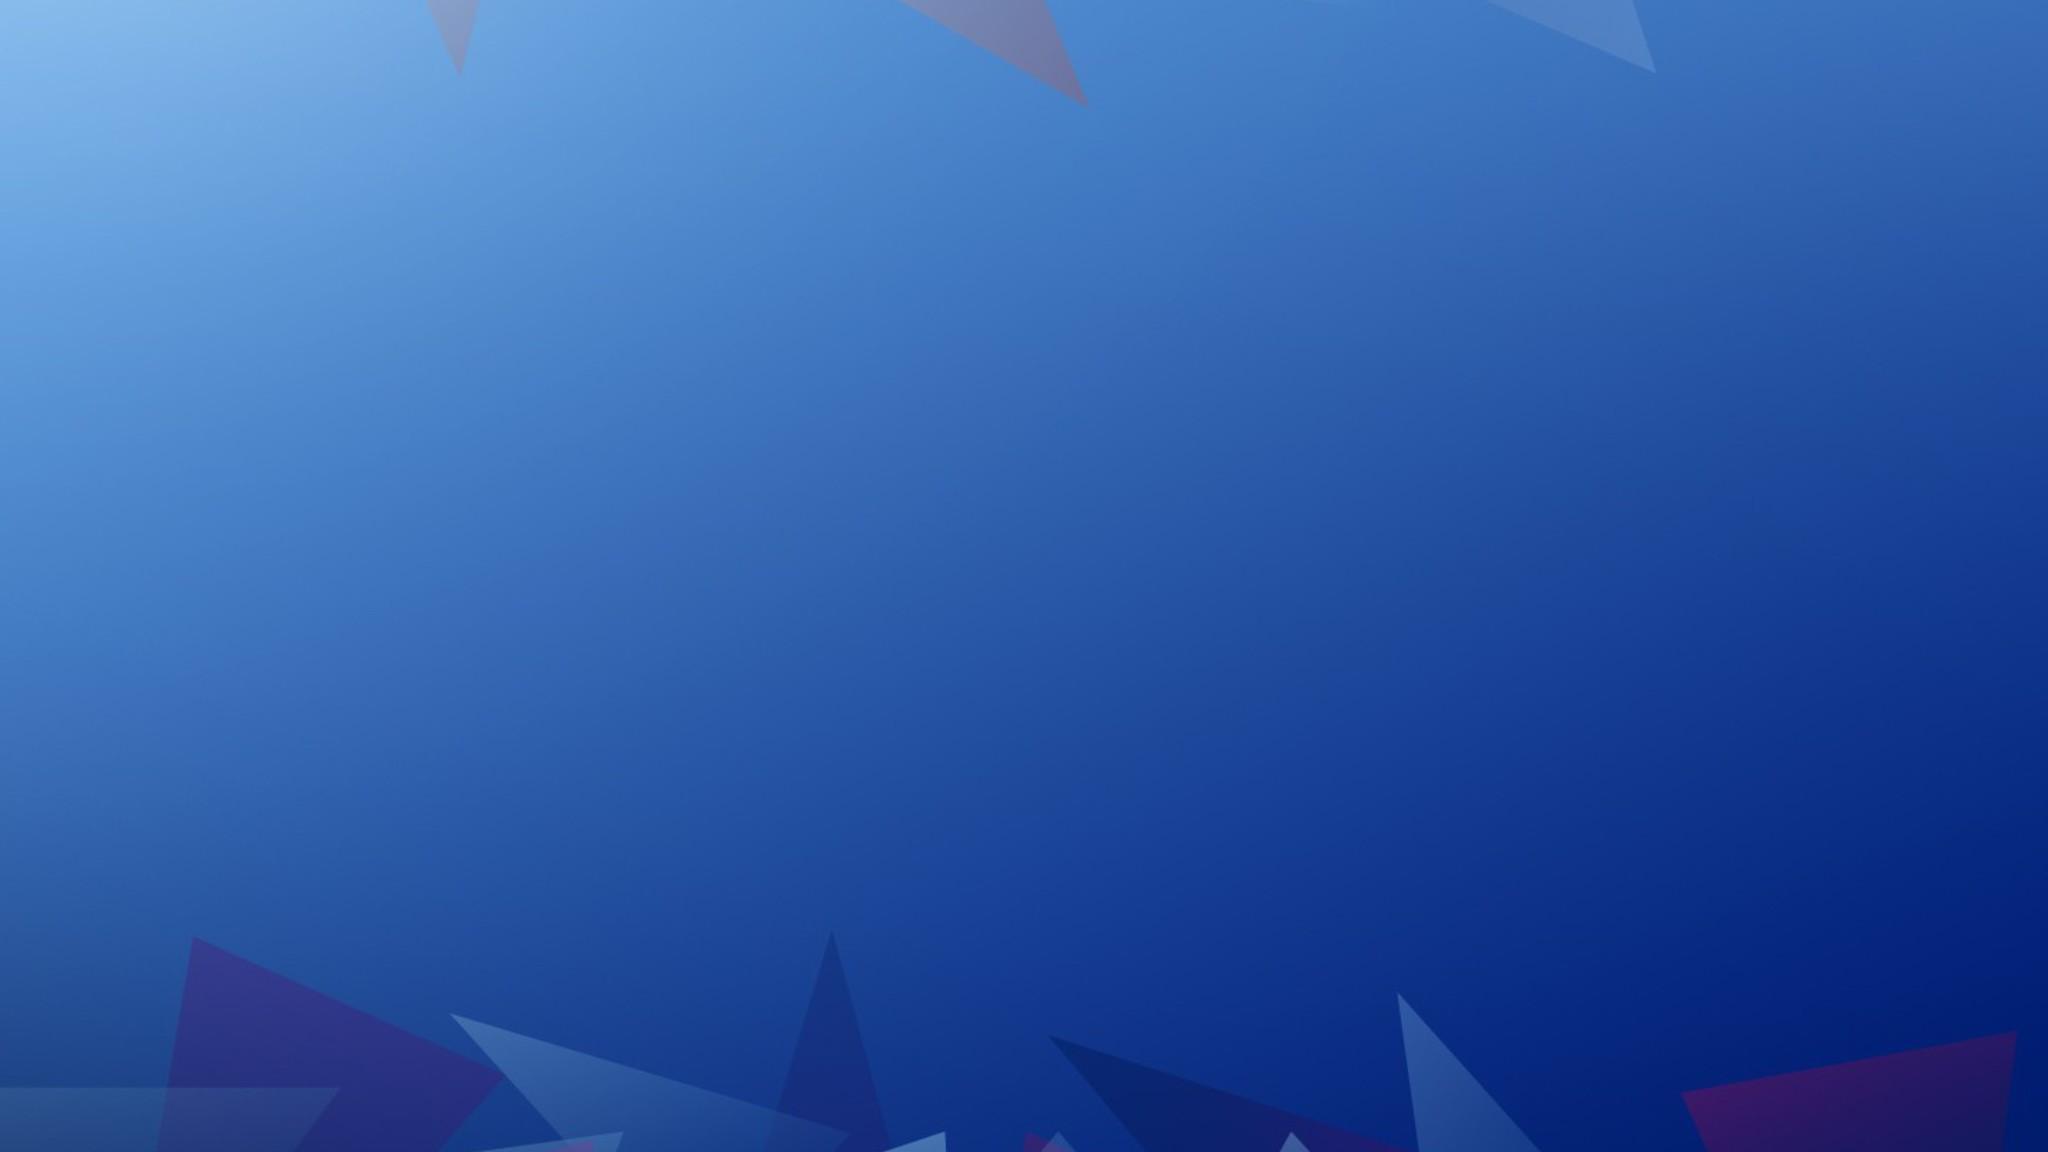 2dゲームの無地の背景 2d壁紙 48x1152 Wallpapertip